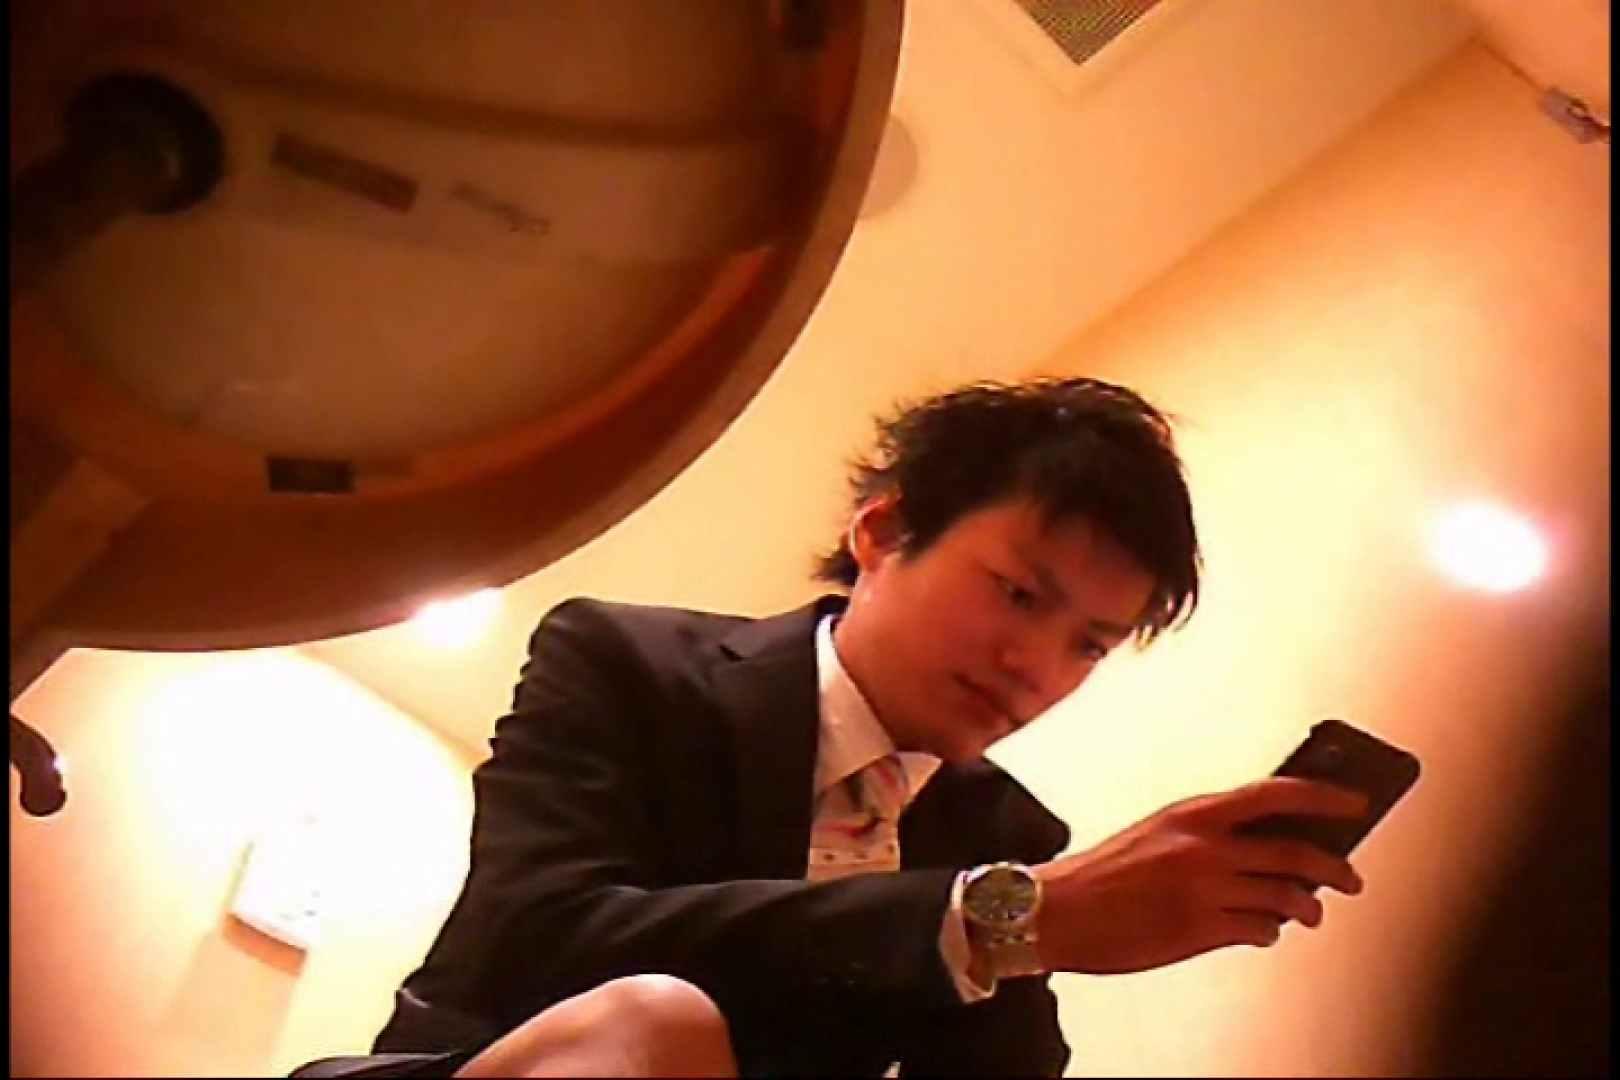 Gボーイ初投稿!掴み取りさんの洗面所覗き!in新幹線!VOL.04 スリム美少年系ジャニ系 | のぞき特集  65枚 21